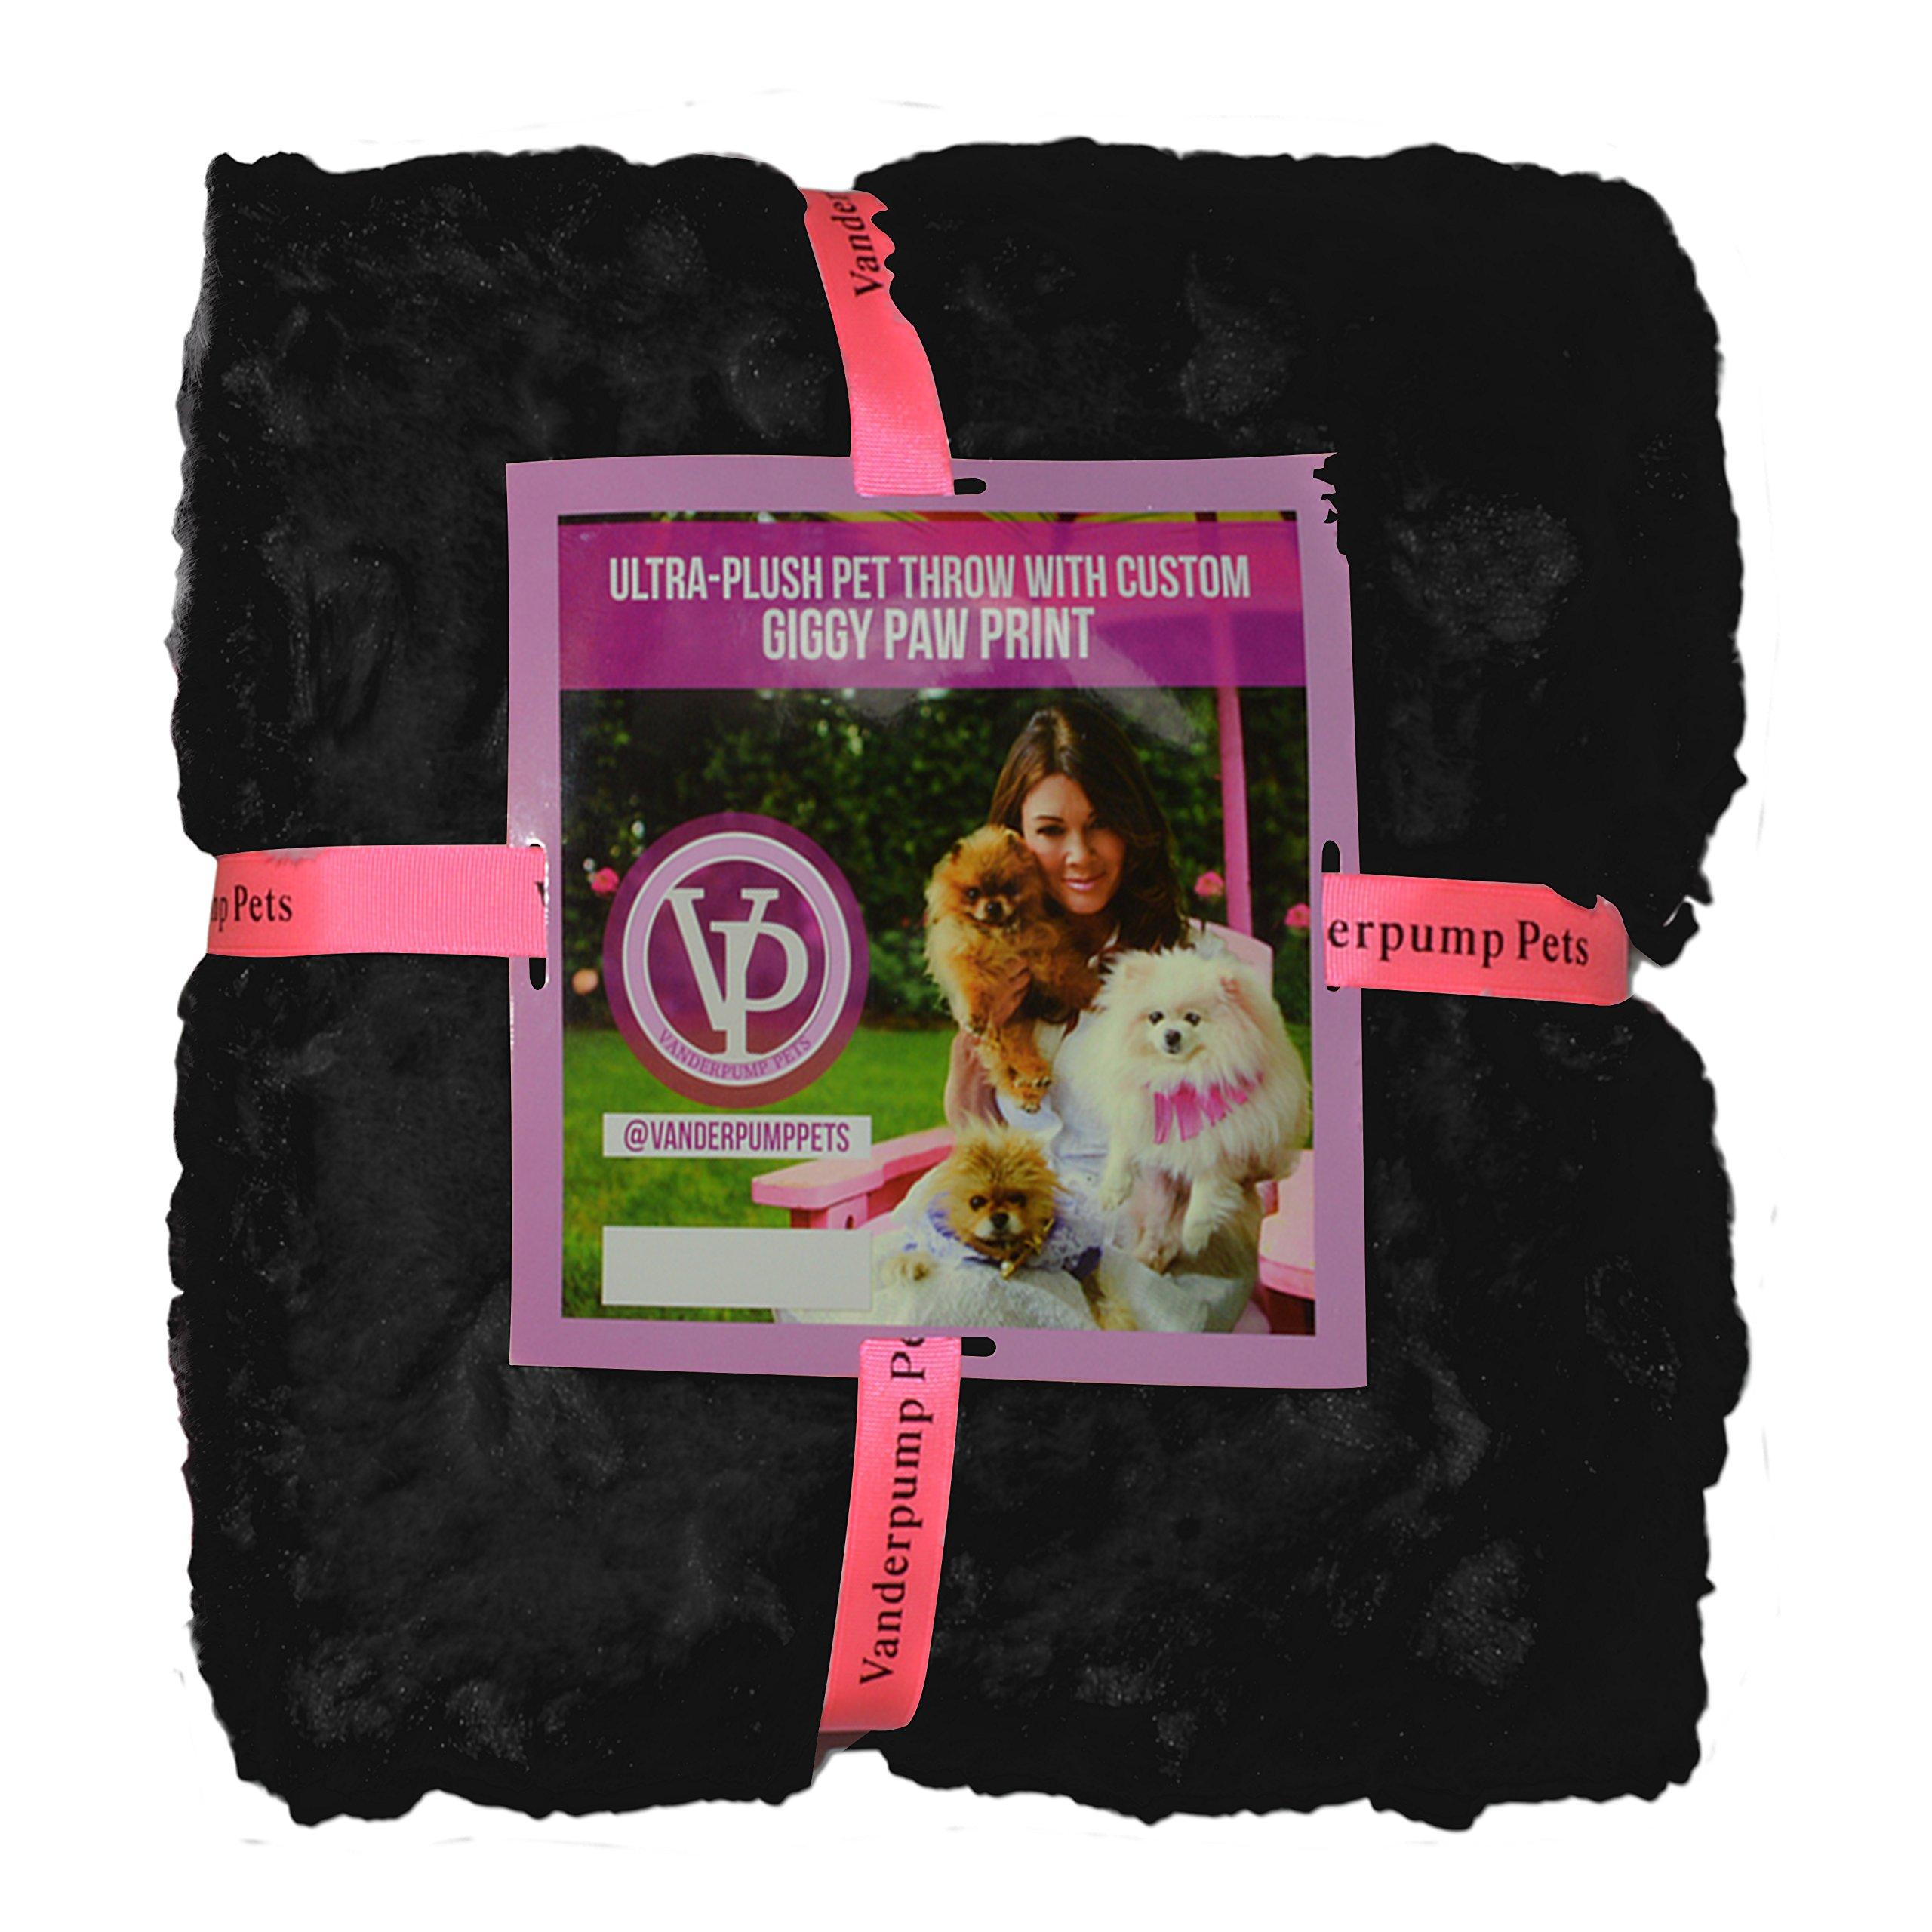 Vanderpump Pets Embroidered Plush Faux Fur Pet Blanket, Black